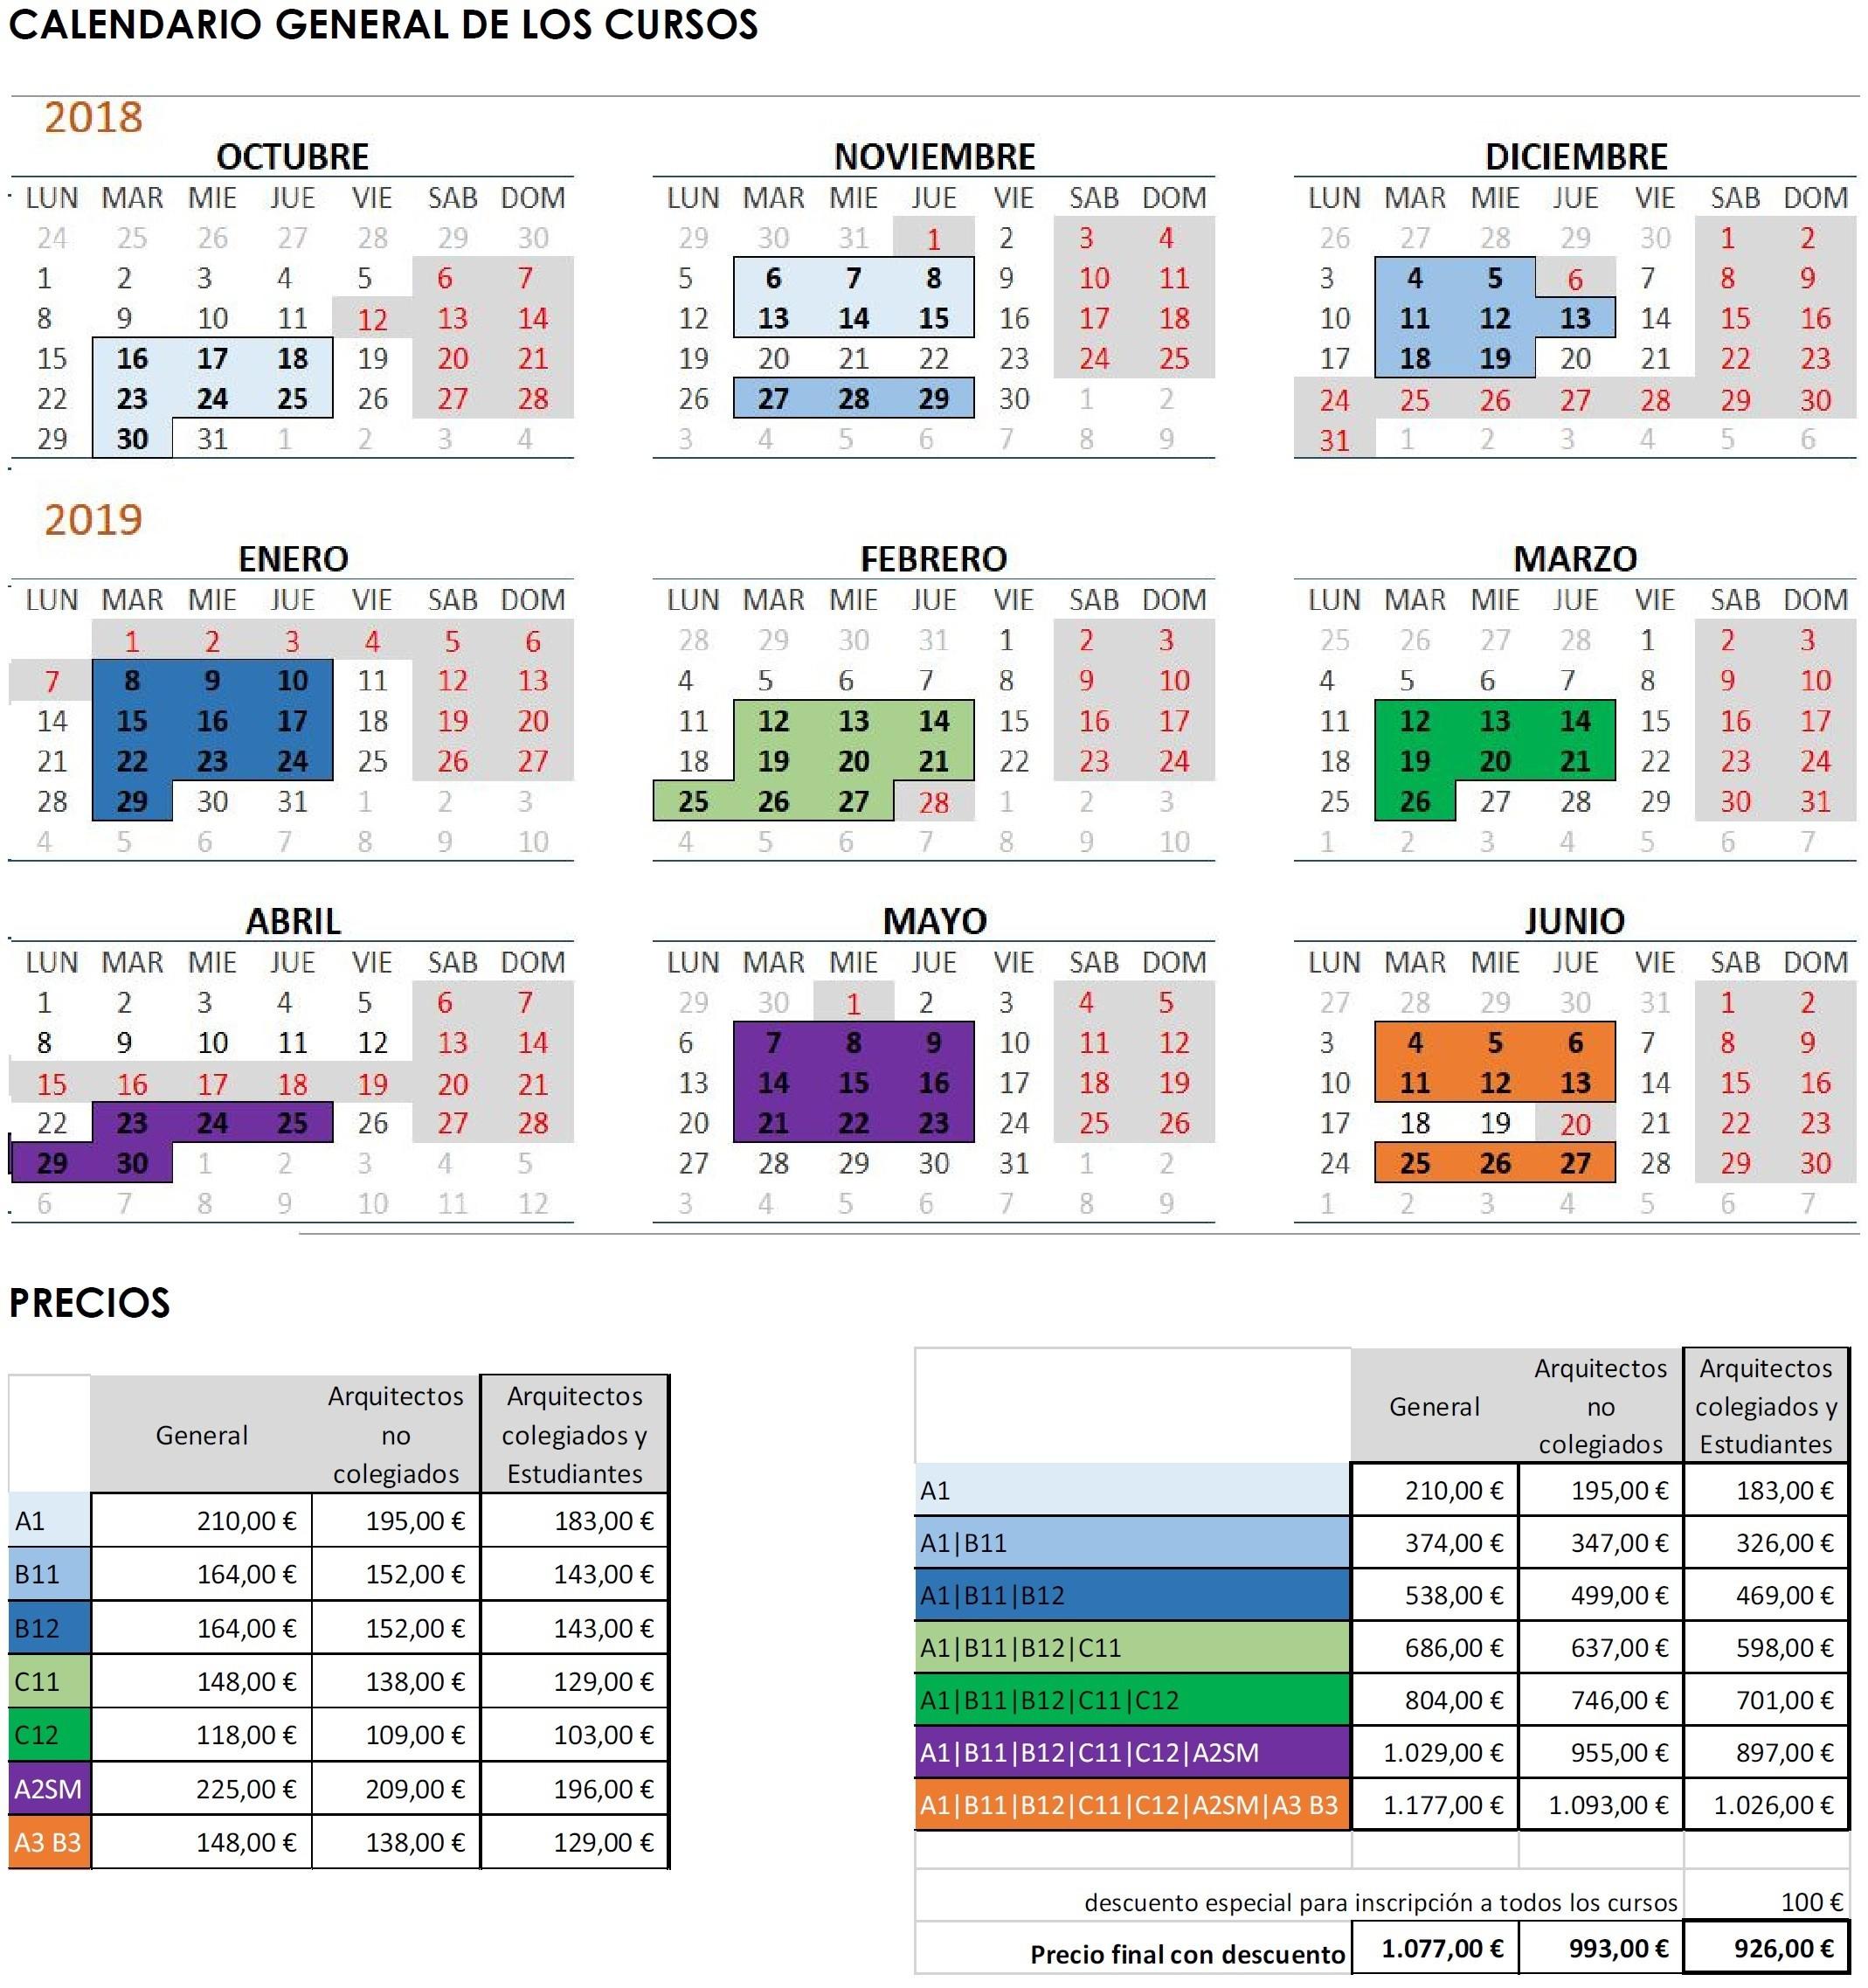 Calendario Festivos 2019 Granada Recientes Curso Pleto Bim Revit Y Curso A1 Modelado Bsico Coa Granada Of Calendario Festivos 2019 Granada Más Reciente Sin Categora Puerto Sherry